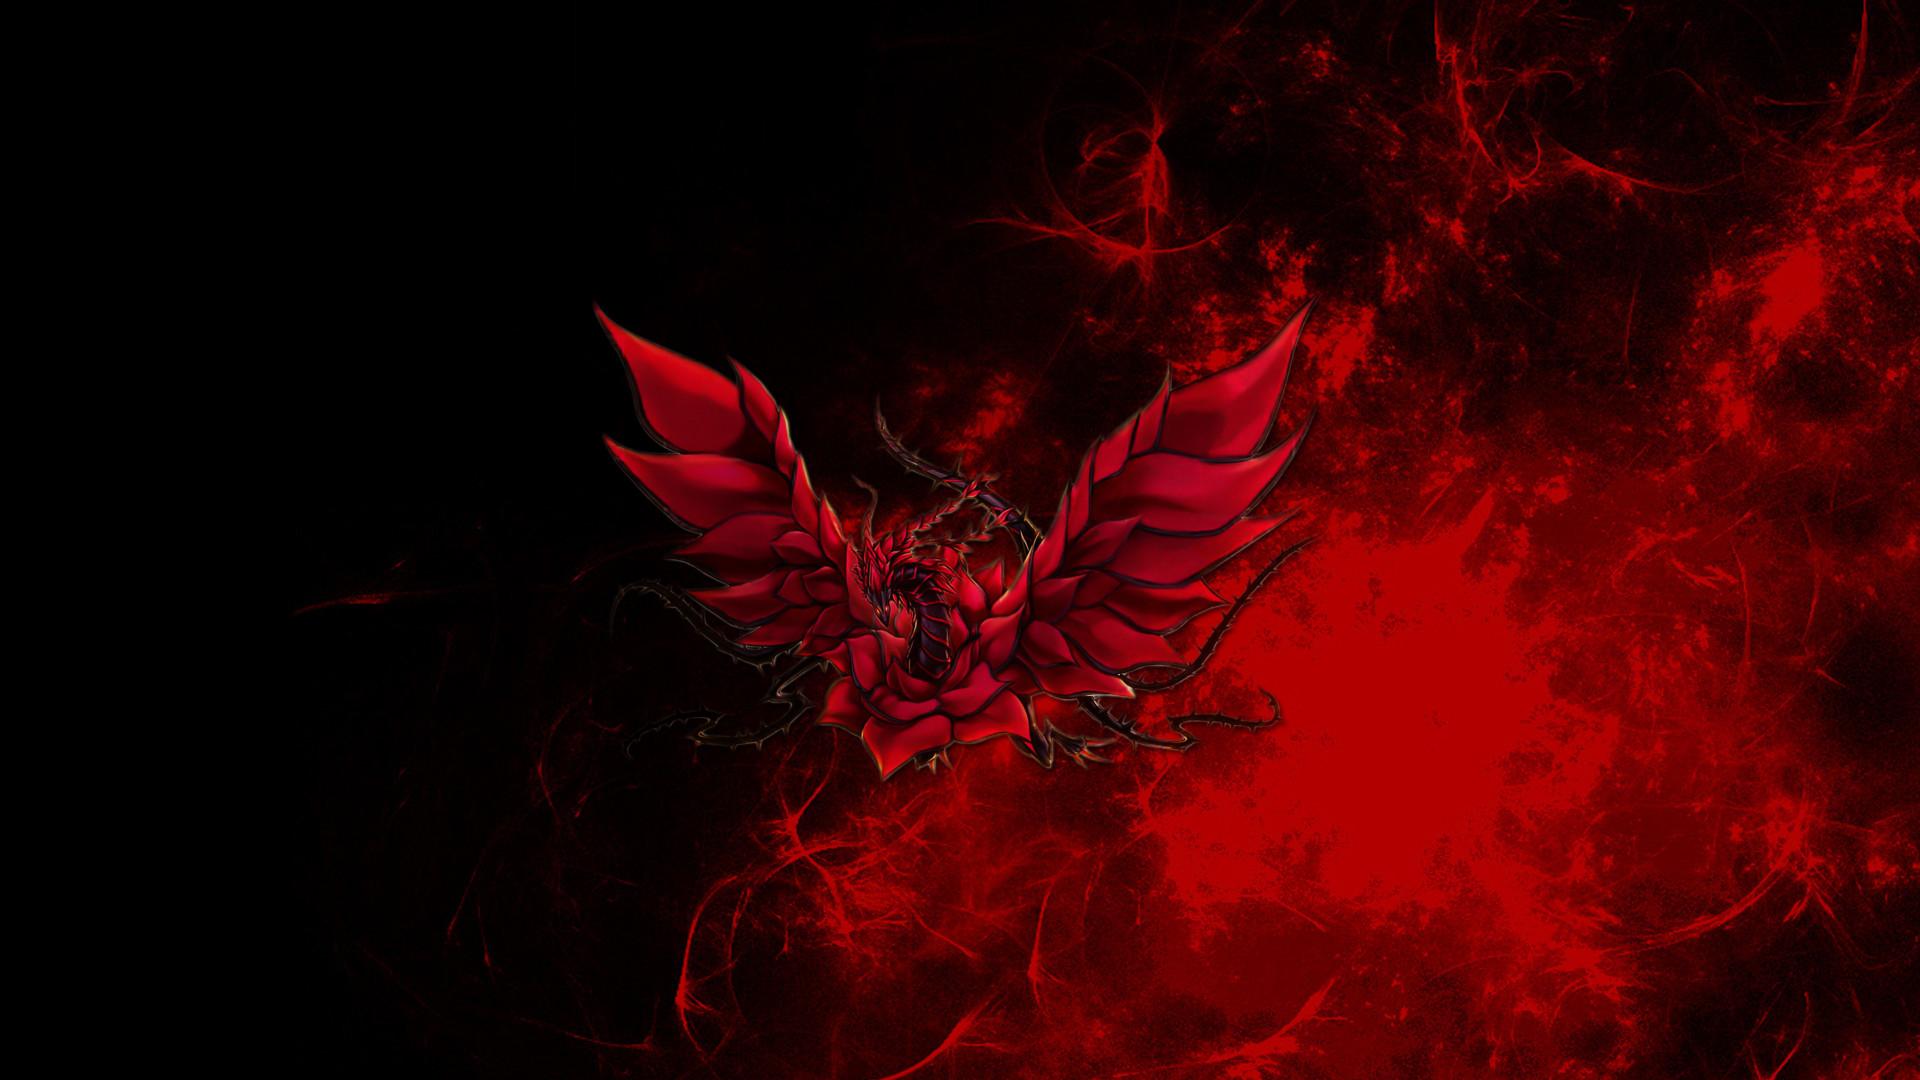 DeviantArt: More Like Black Rose Dragon Wallpaper by RJGiel